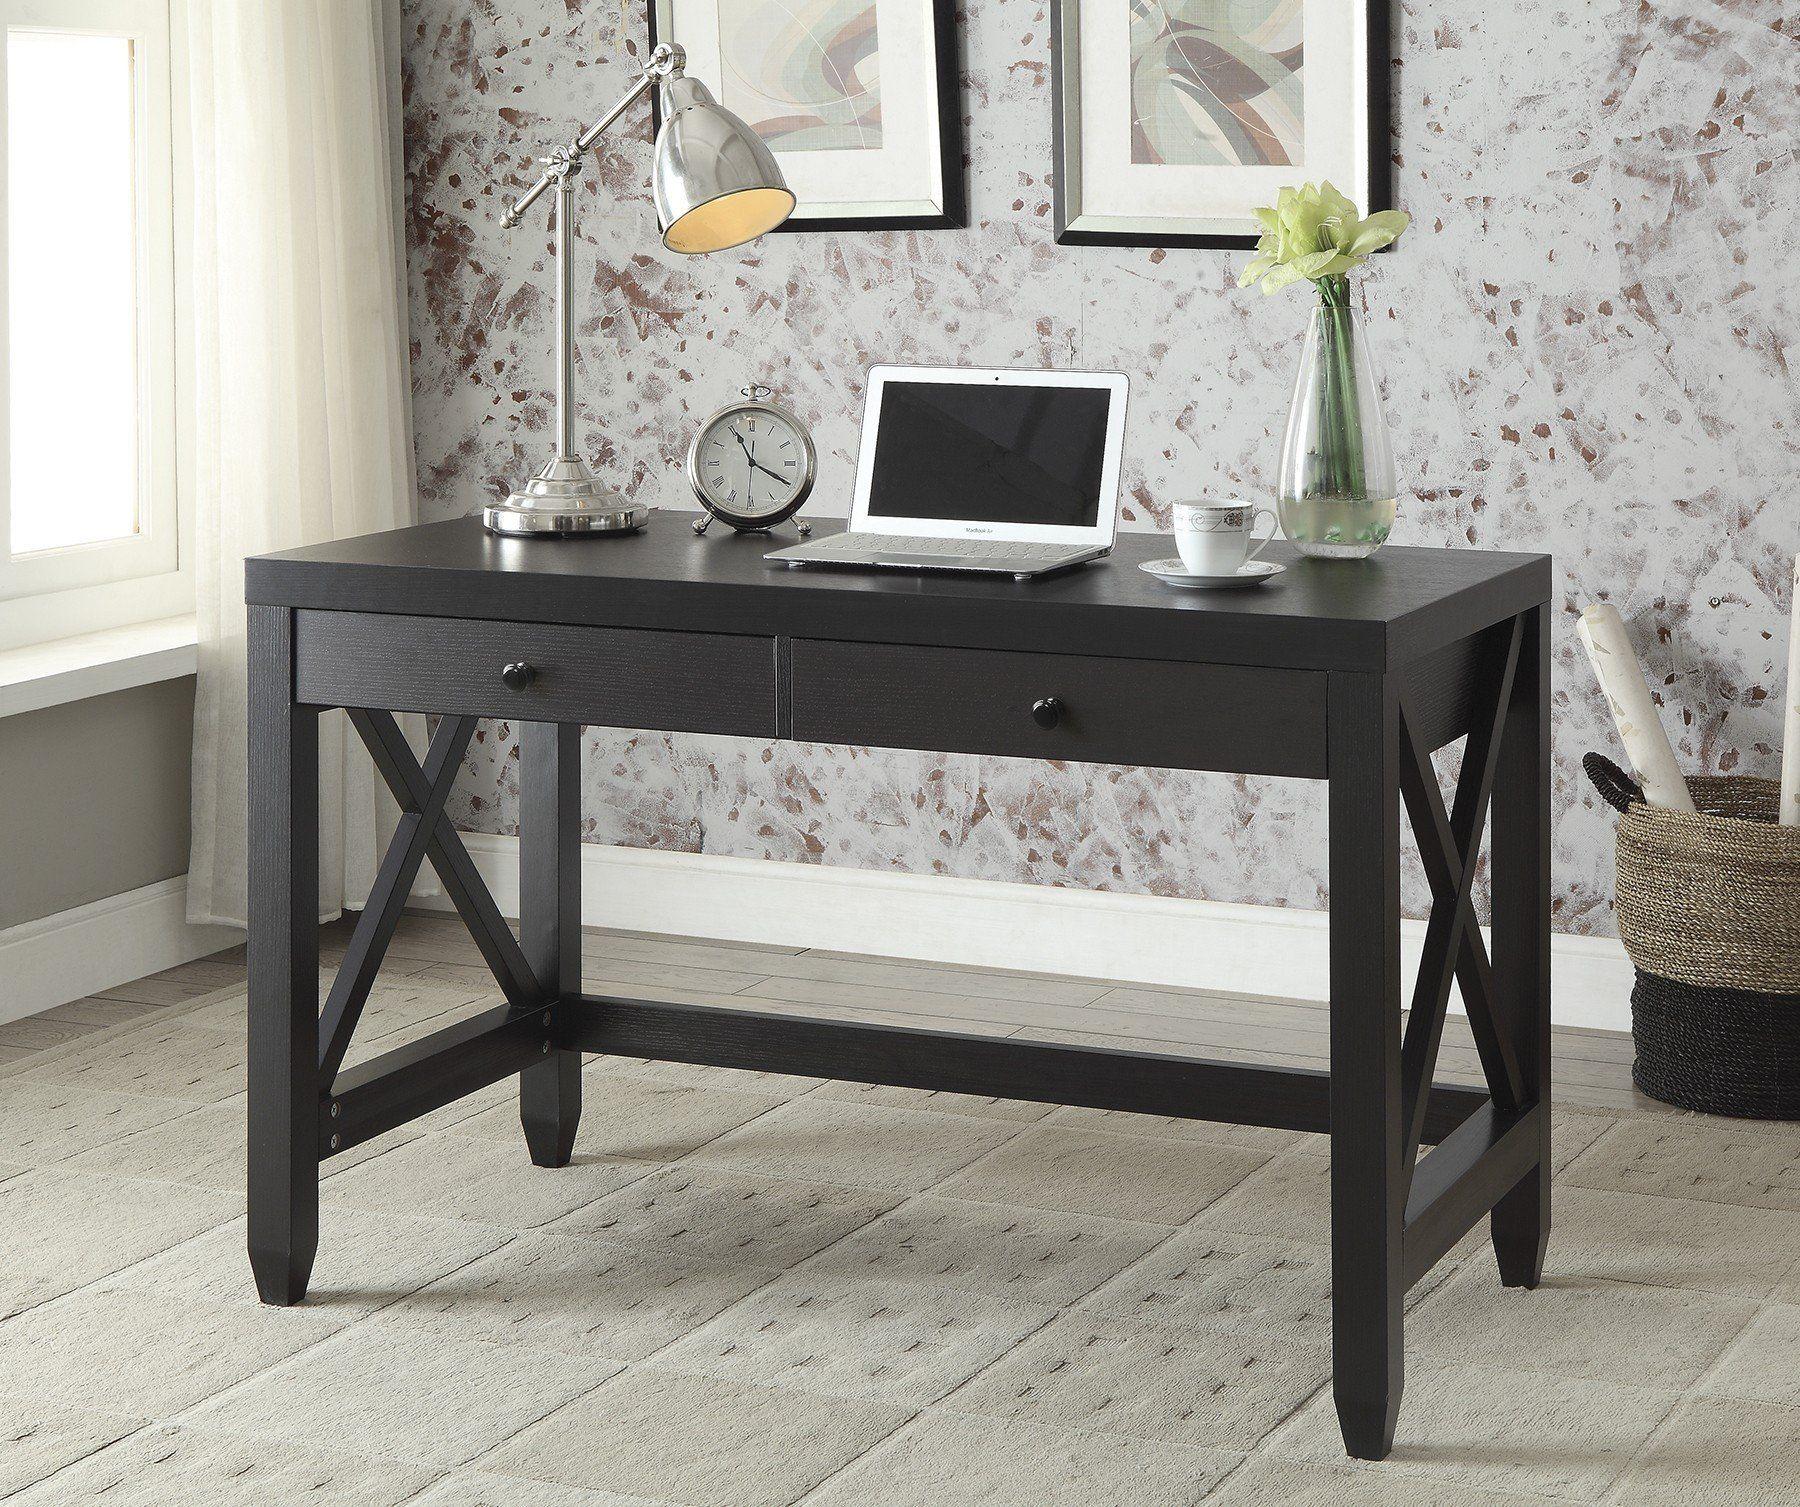 Ct801351 humfrye cappuccino writing desk furniture